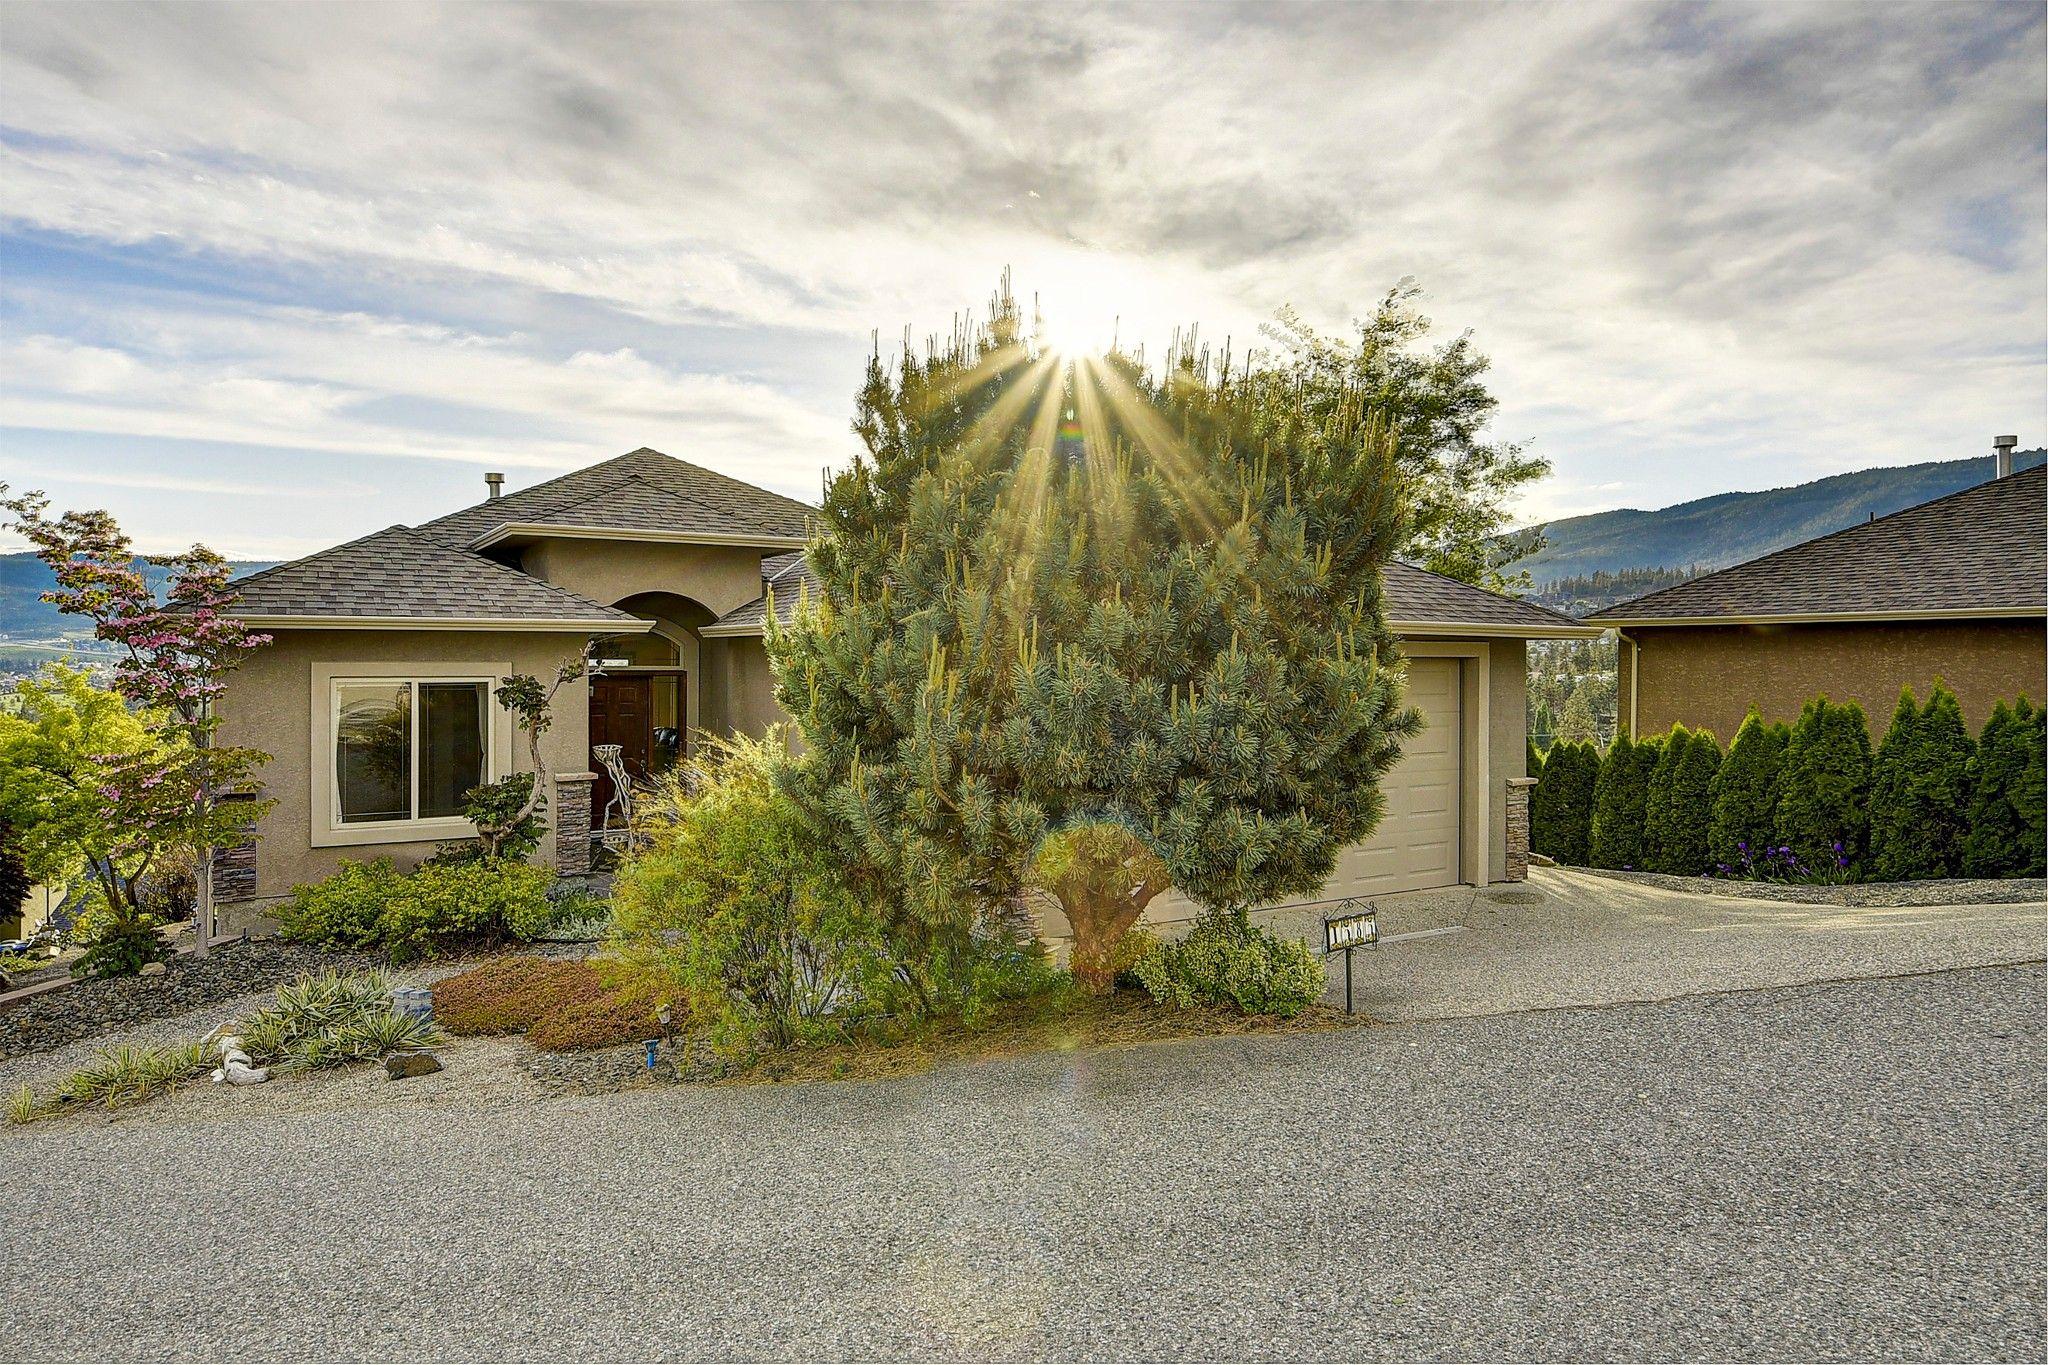 Main Photo: 1585 Merlot Drive, in West Kelowna: House for sale : MLS®# 10209520